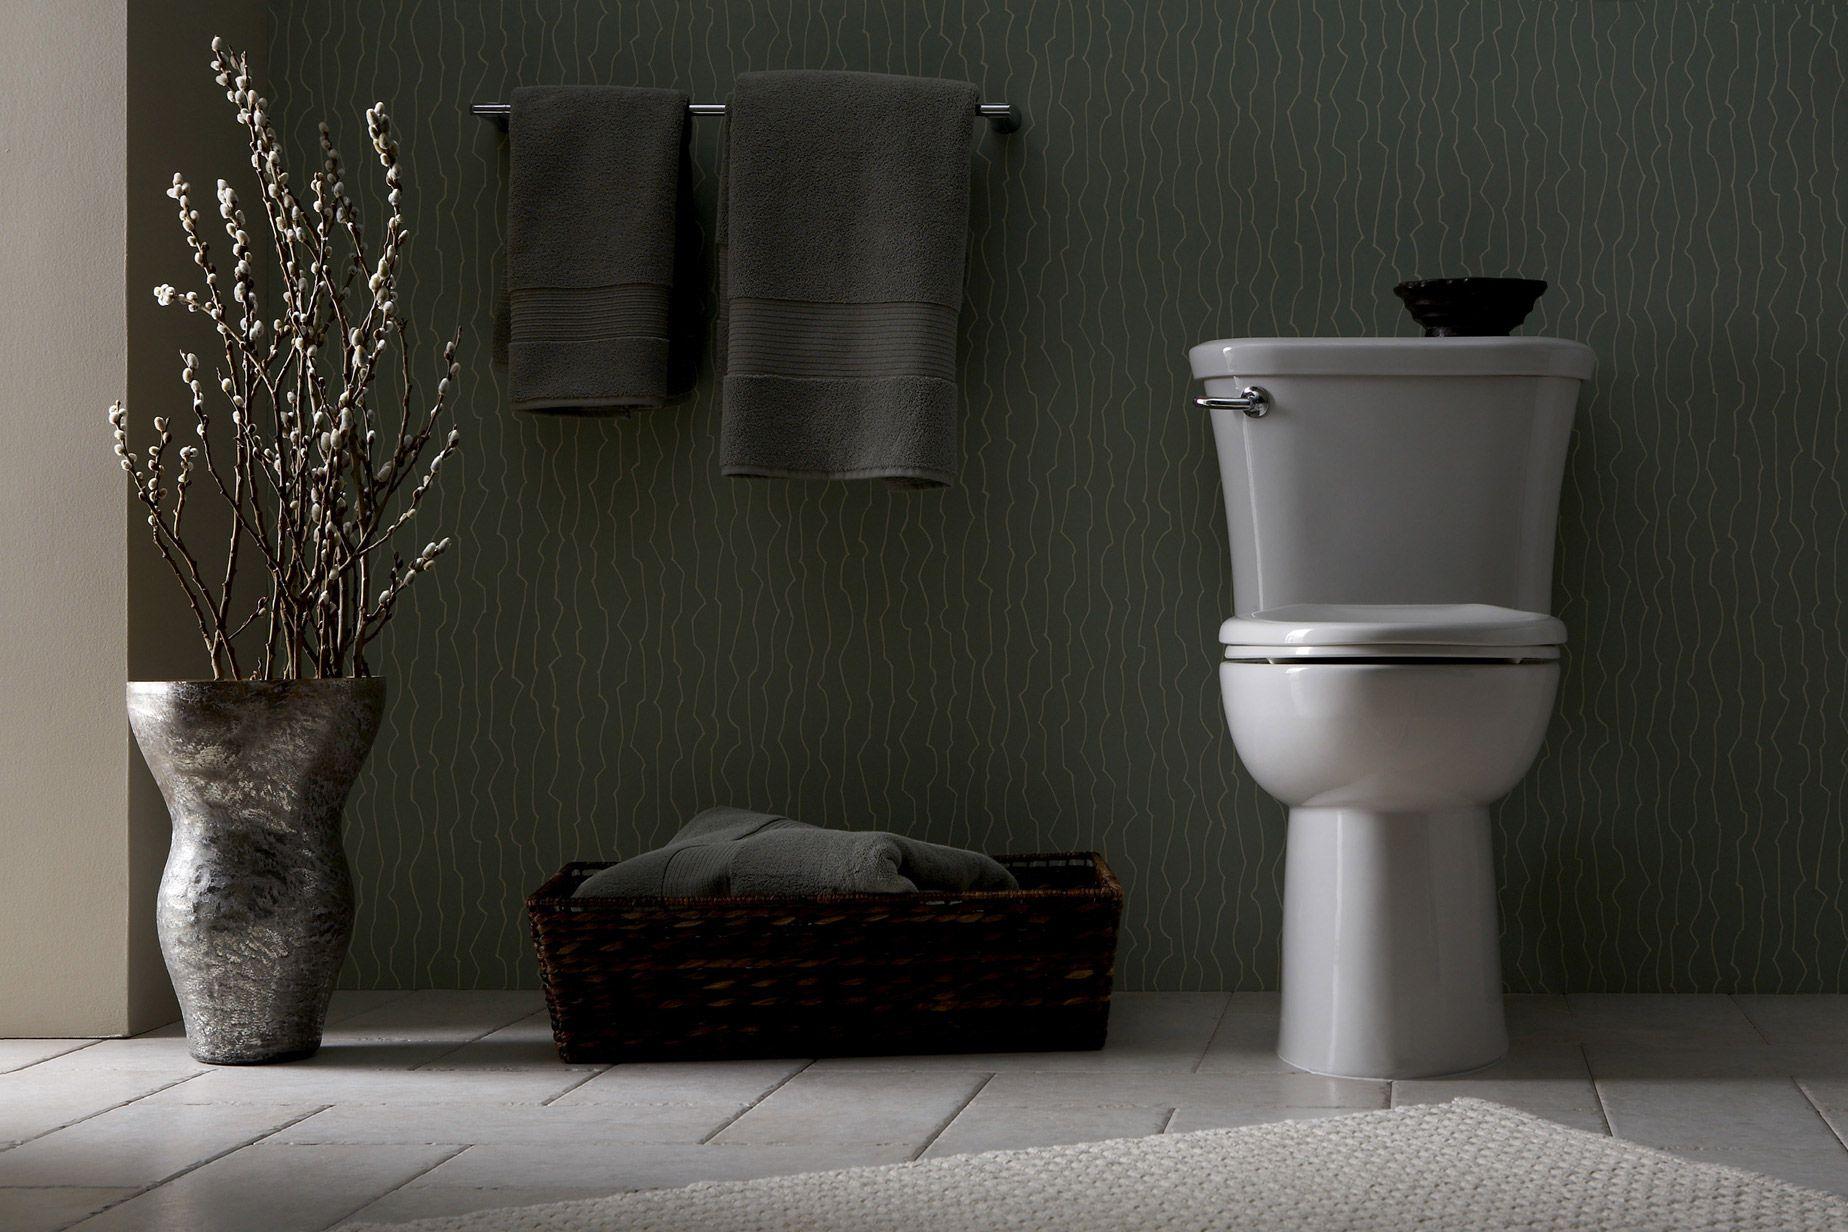 American Standard S Modern Toilet For Stylish Bathroom Tropic Collection Toilet Bathroom Toilets Bathroom